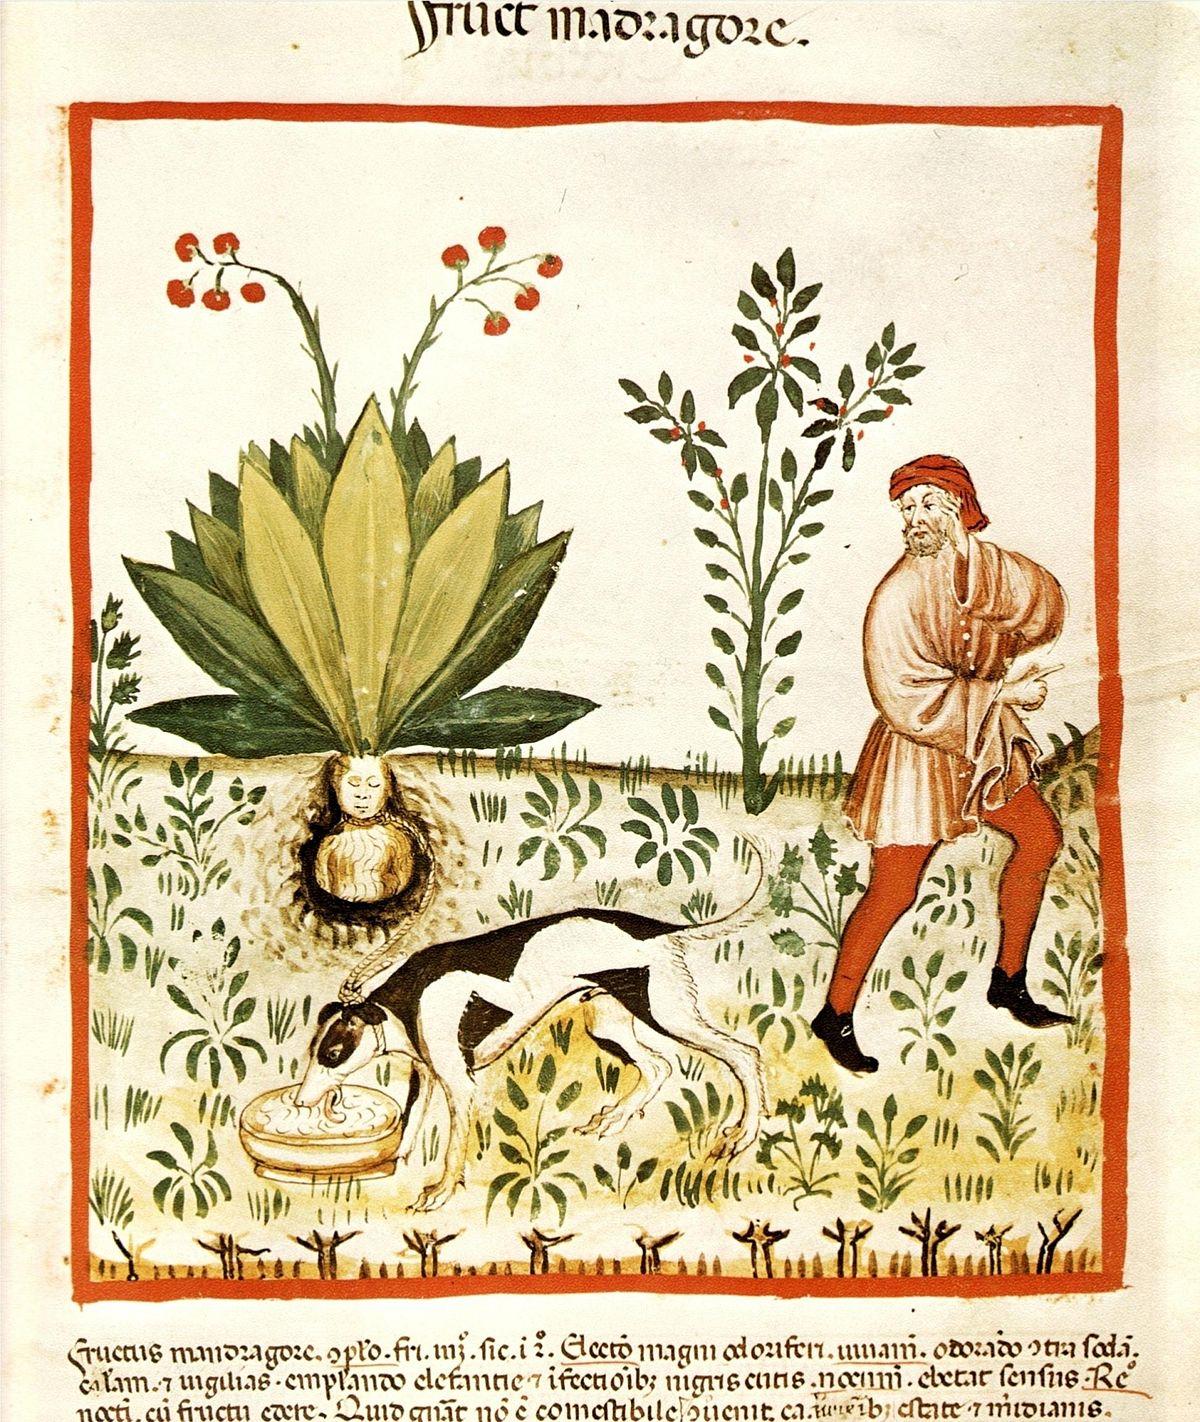 Tacuina sanitatis - Wikipedia